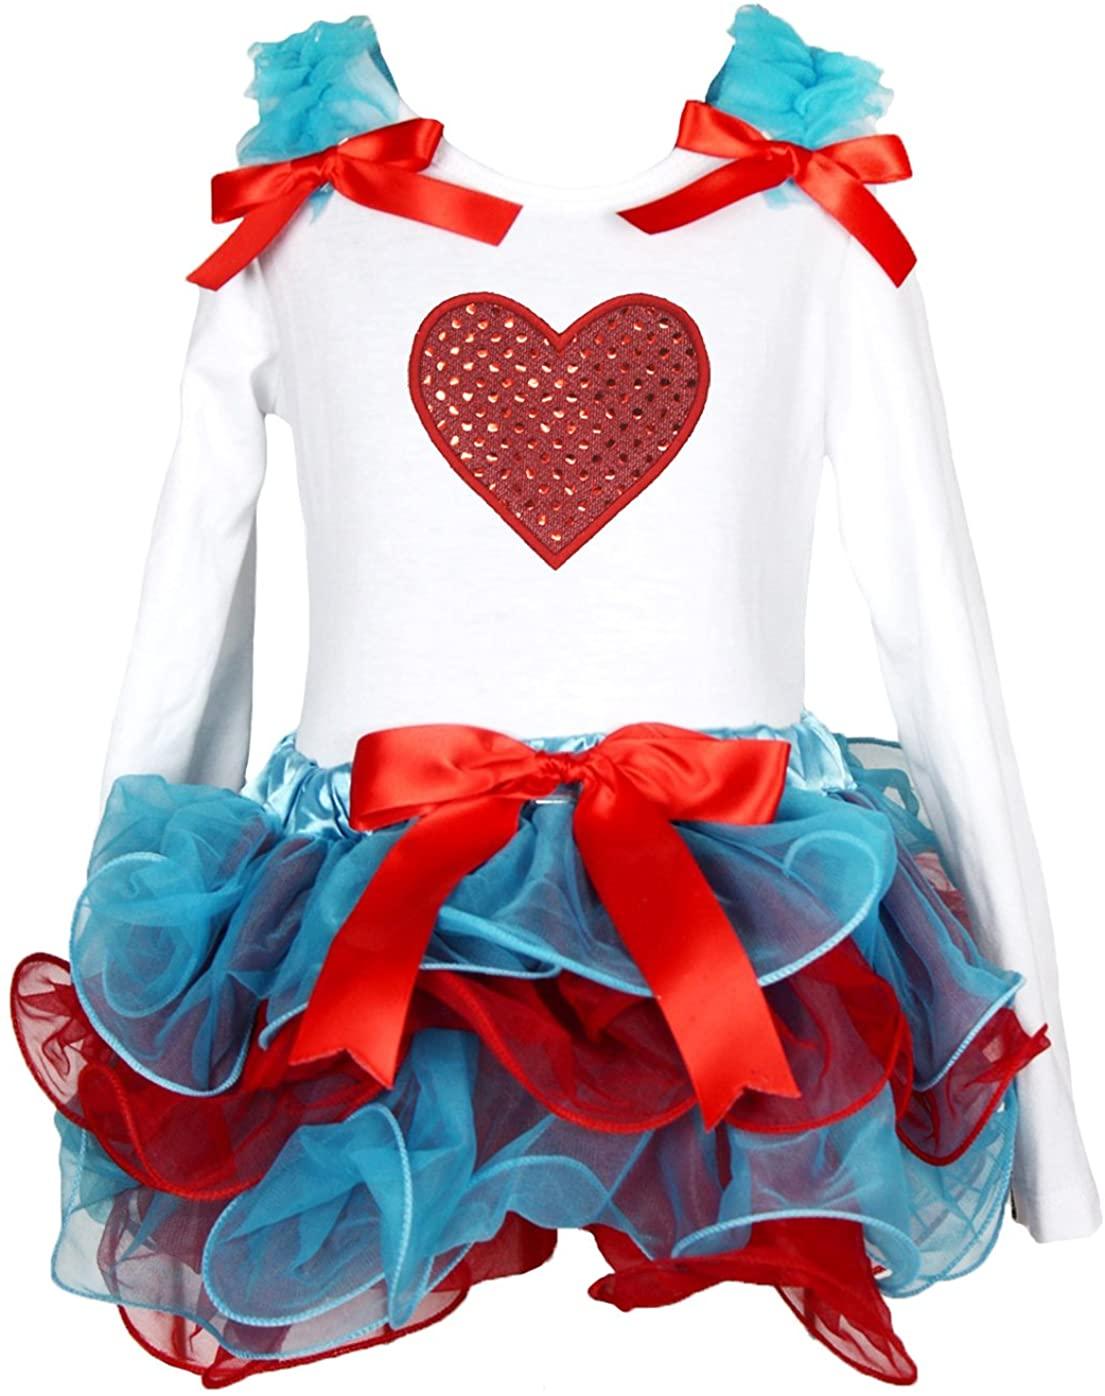 Valentine Dress Bling Heart L/s White Shirt Blue Red Petal Skirt Set 1-8y